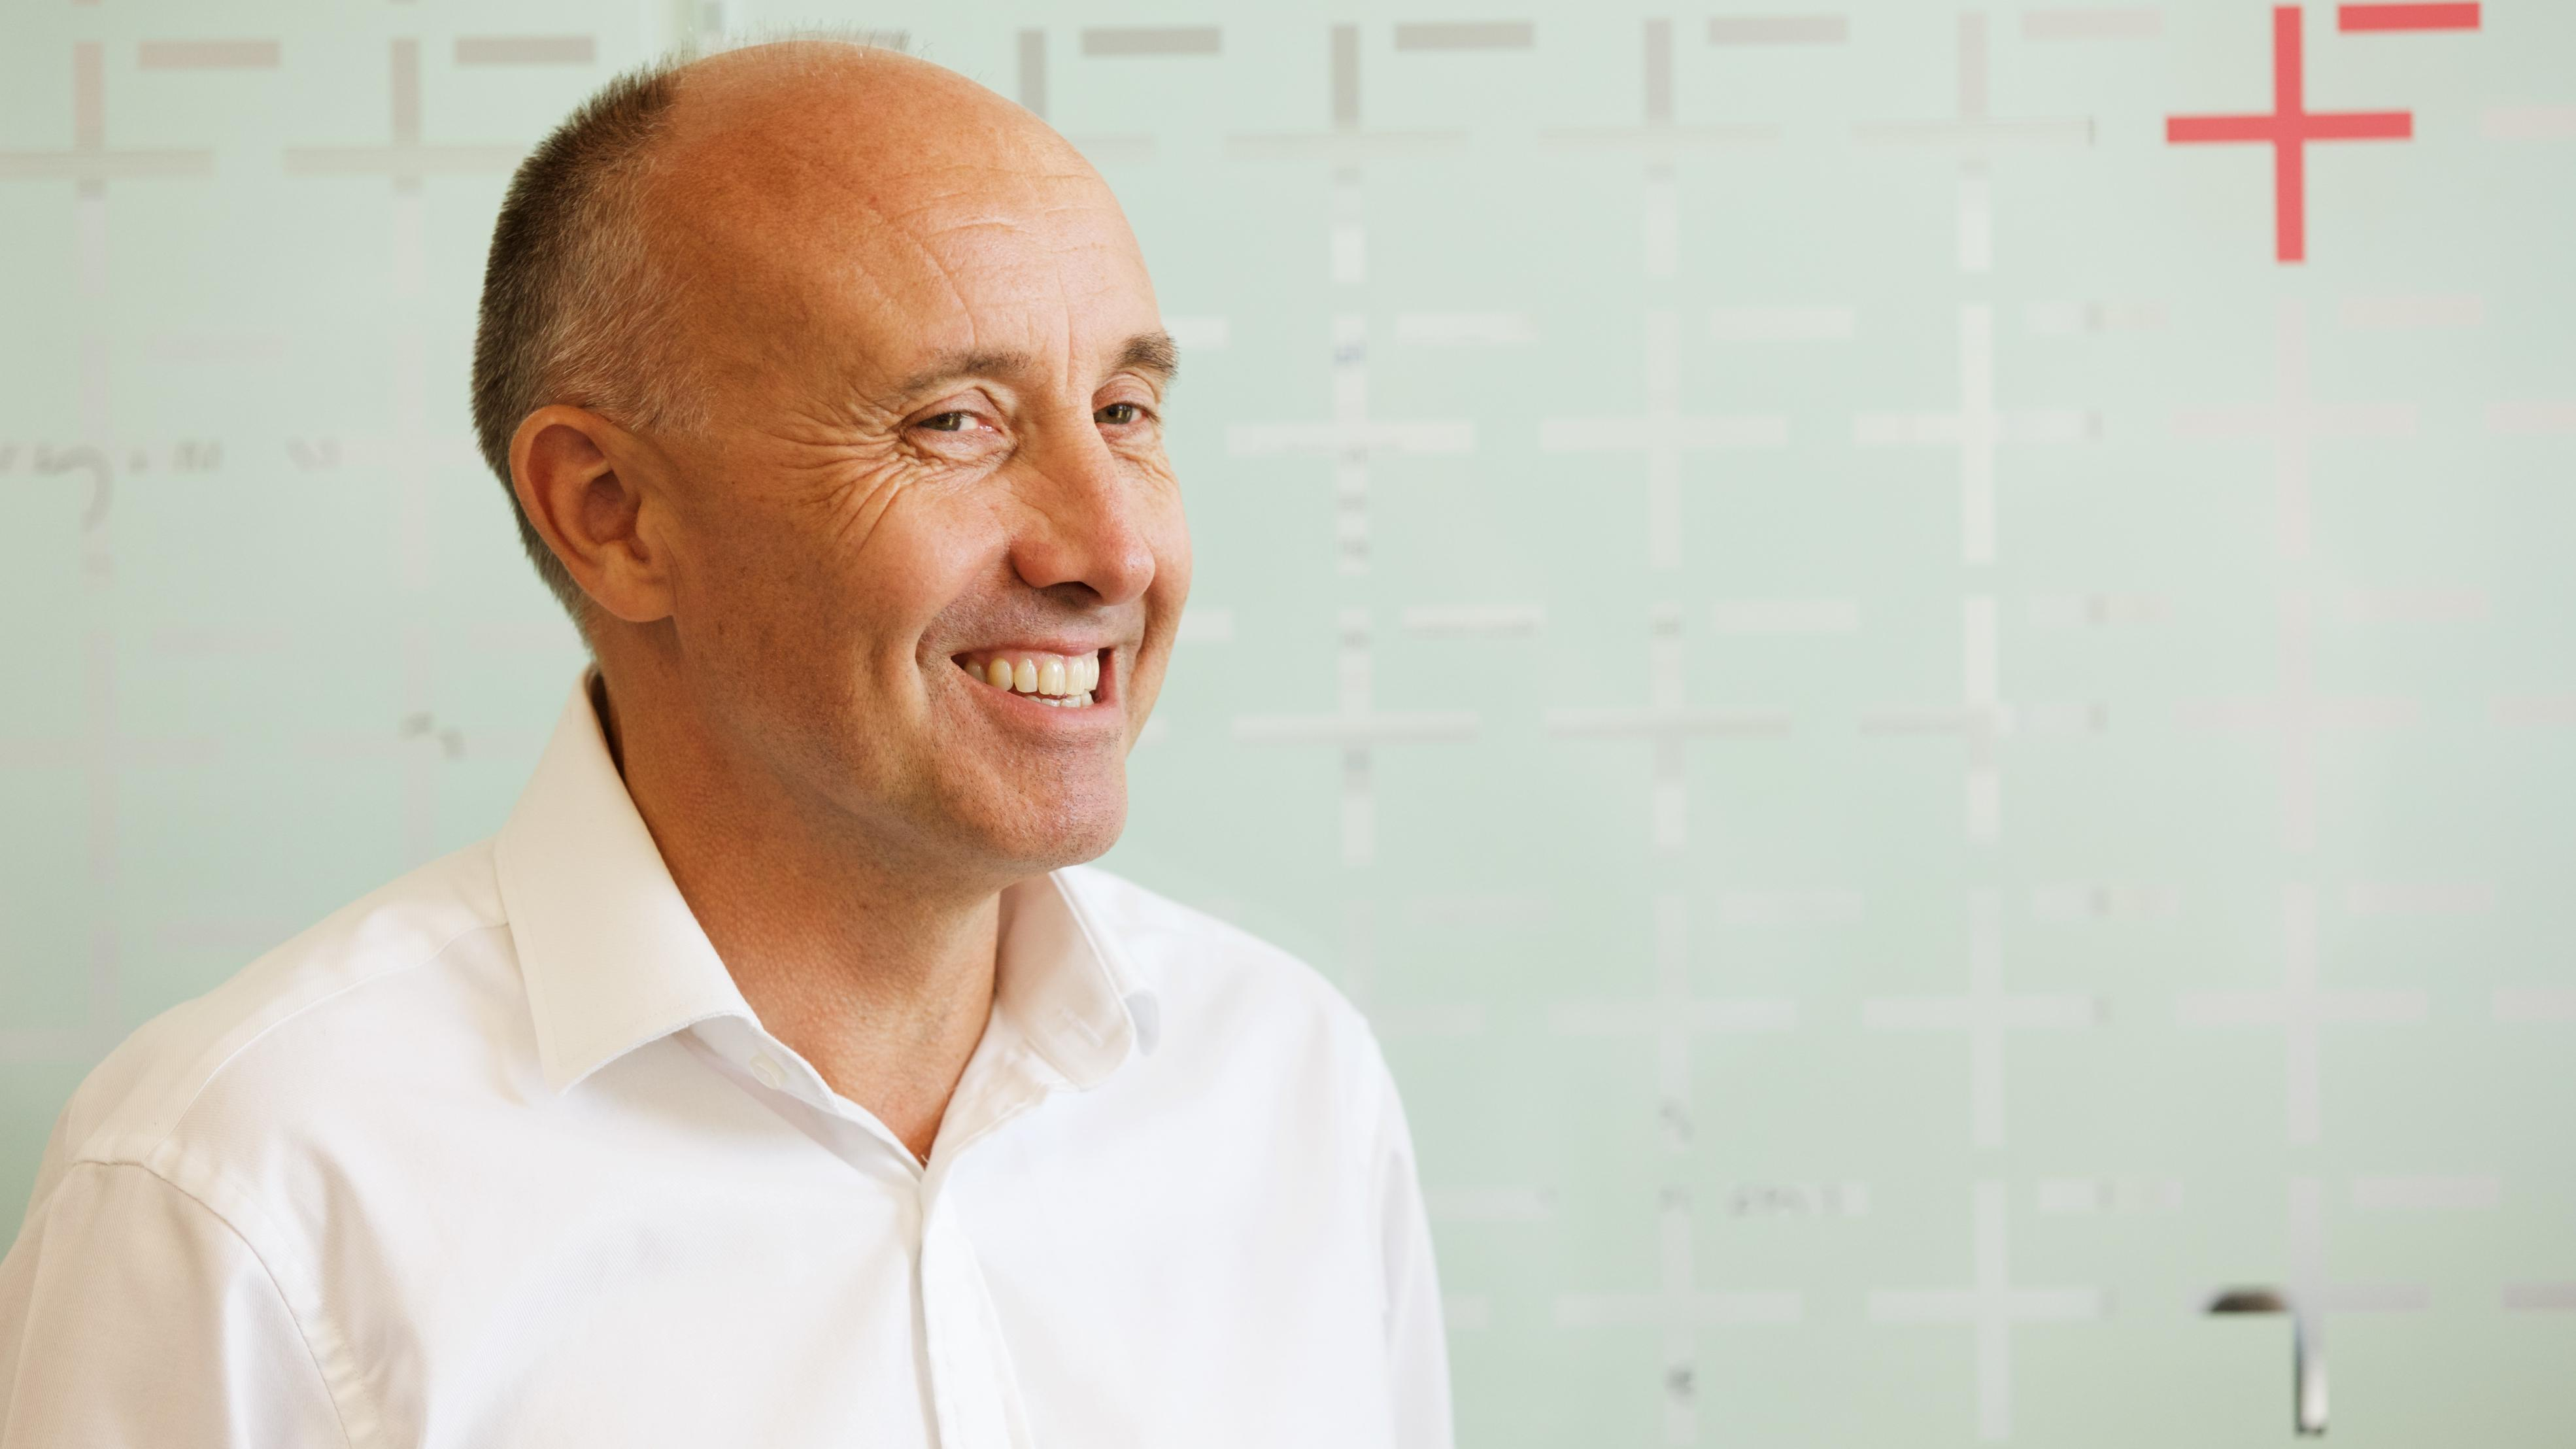 Ex-BP man takes charge at Faraday